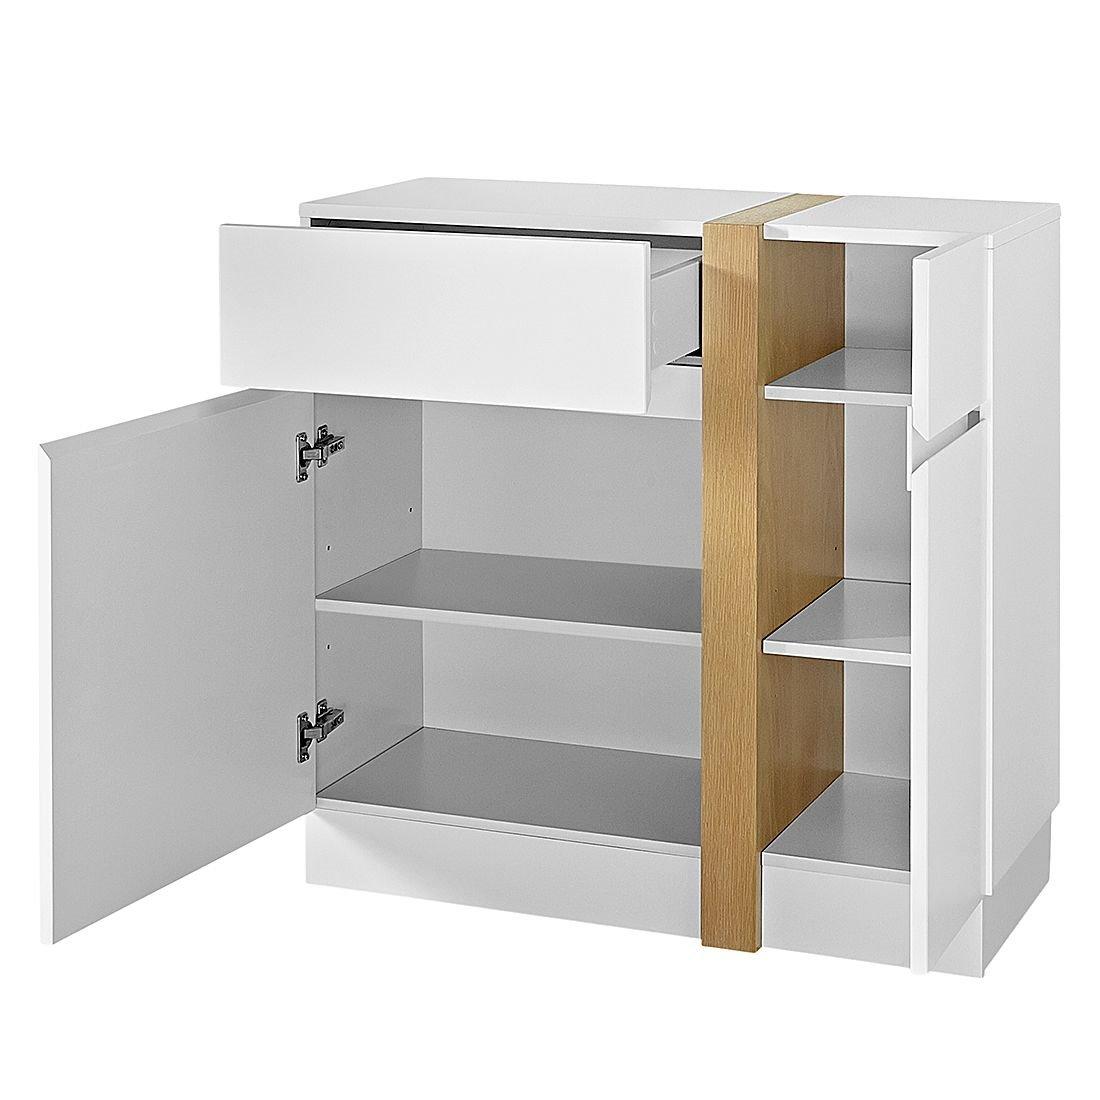 kommode highboard anrichte sideboard flur dielen schrank wei matt eiche ebay. Black Bedroom Furniture Sets. Home Design Ideas